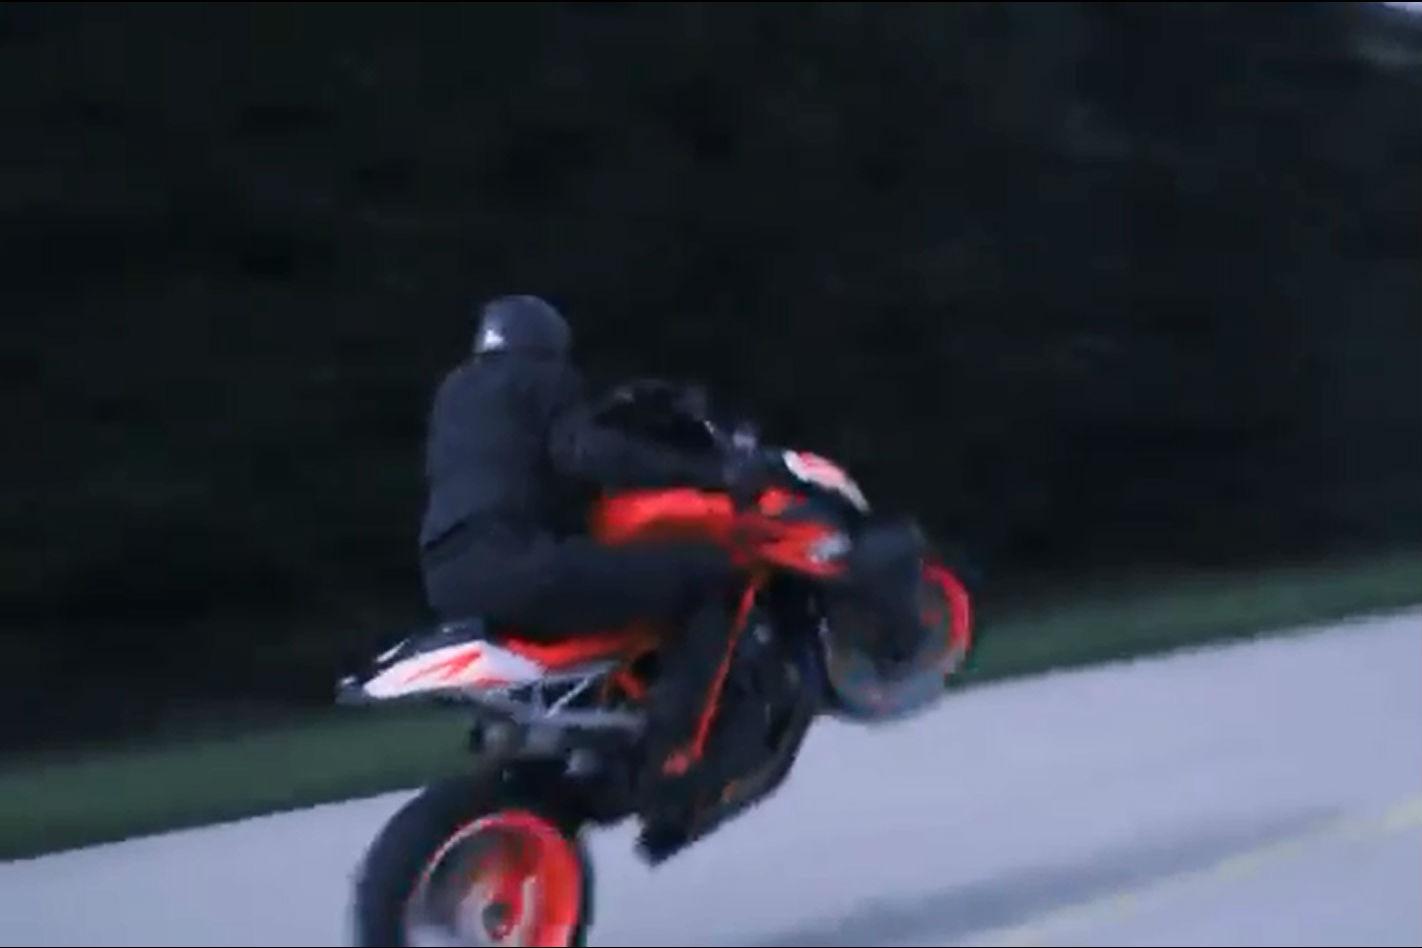 KTM attacked over 'aggressive' promo video